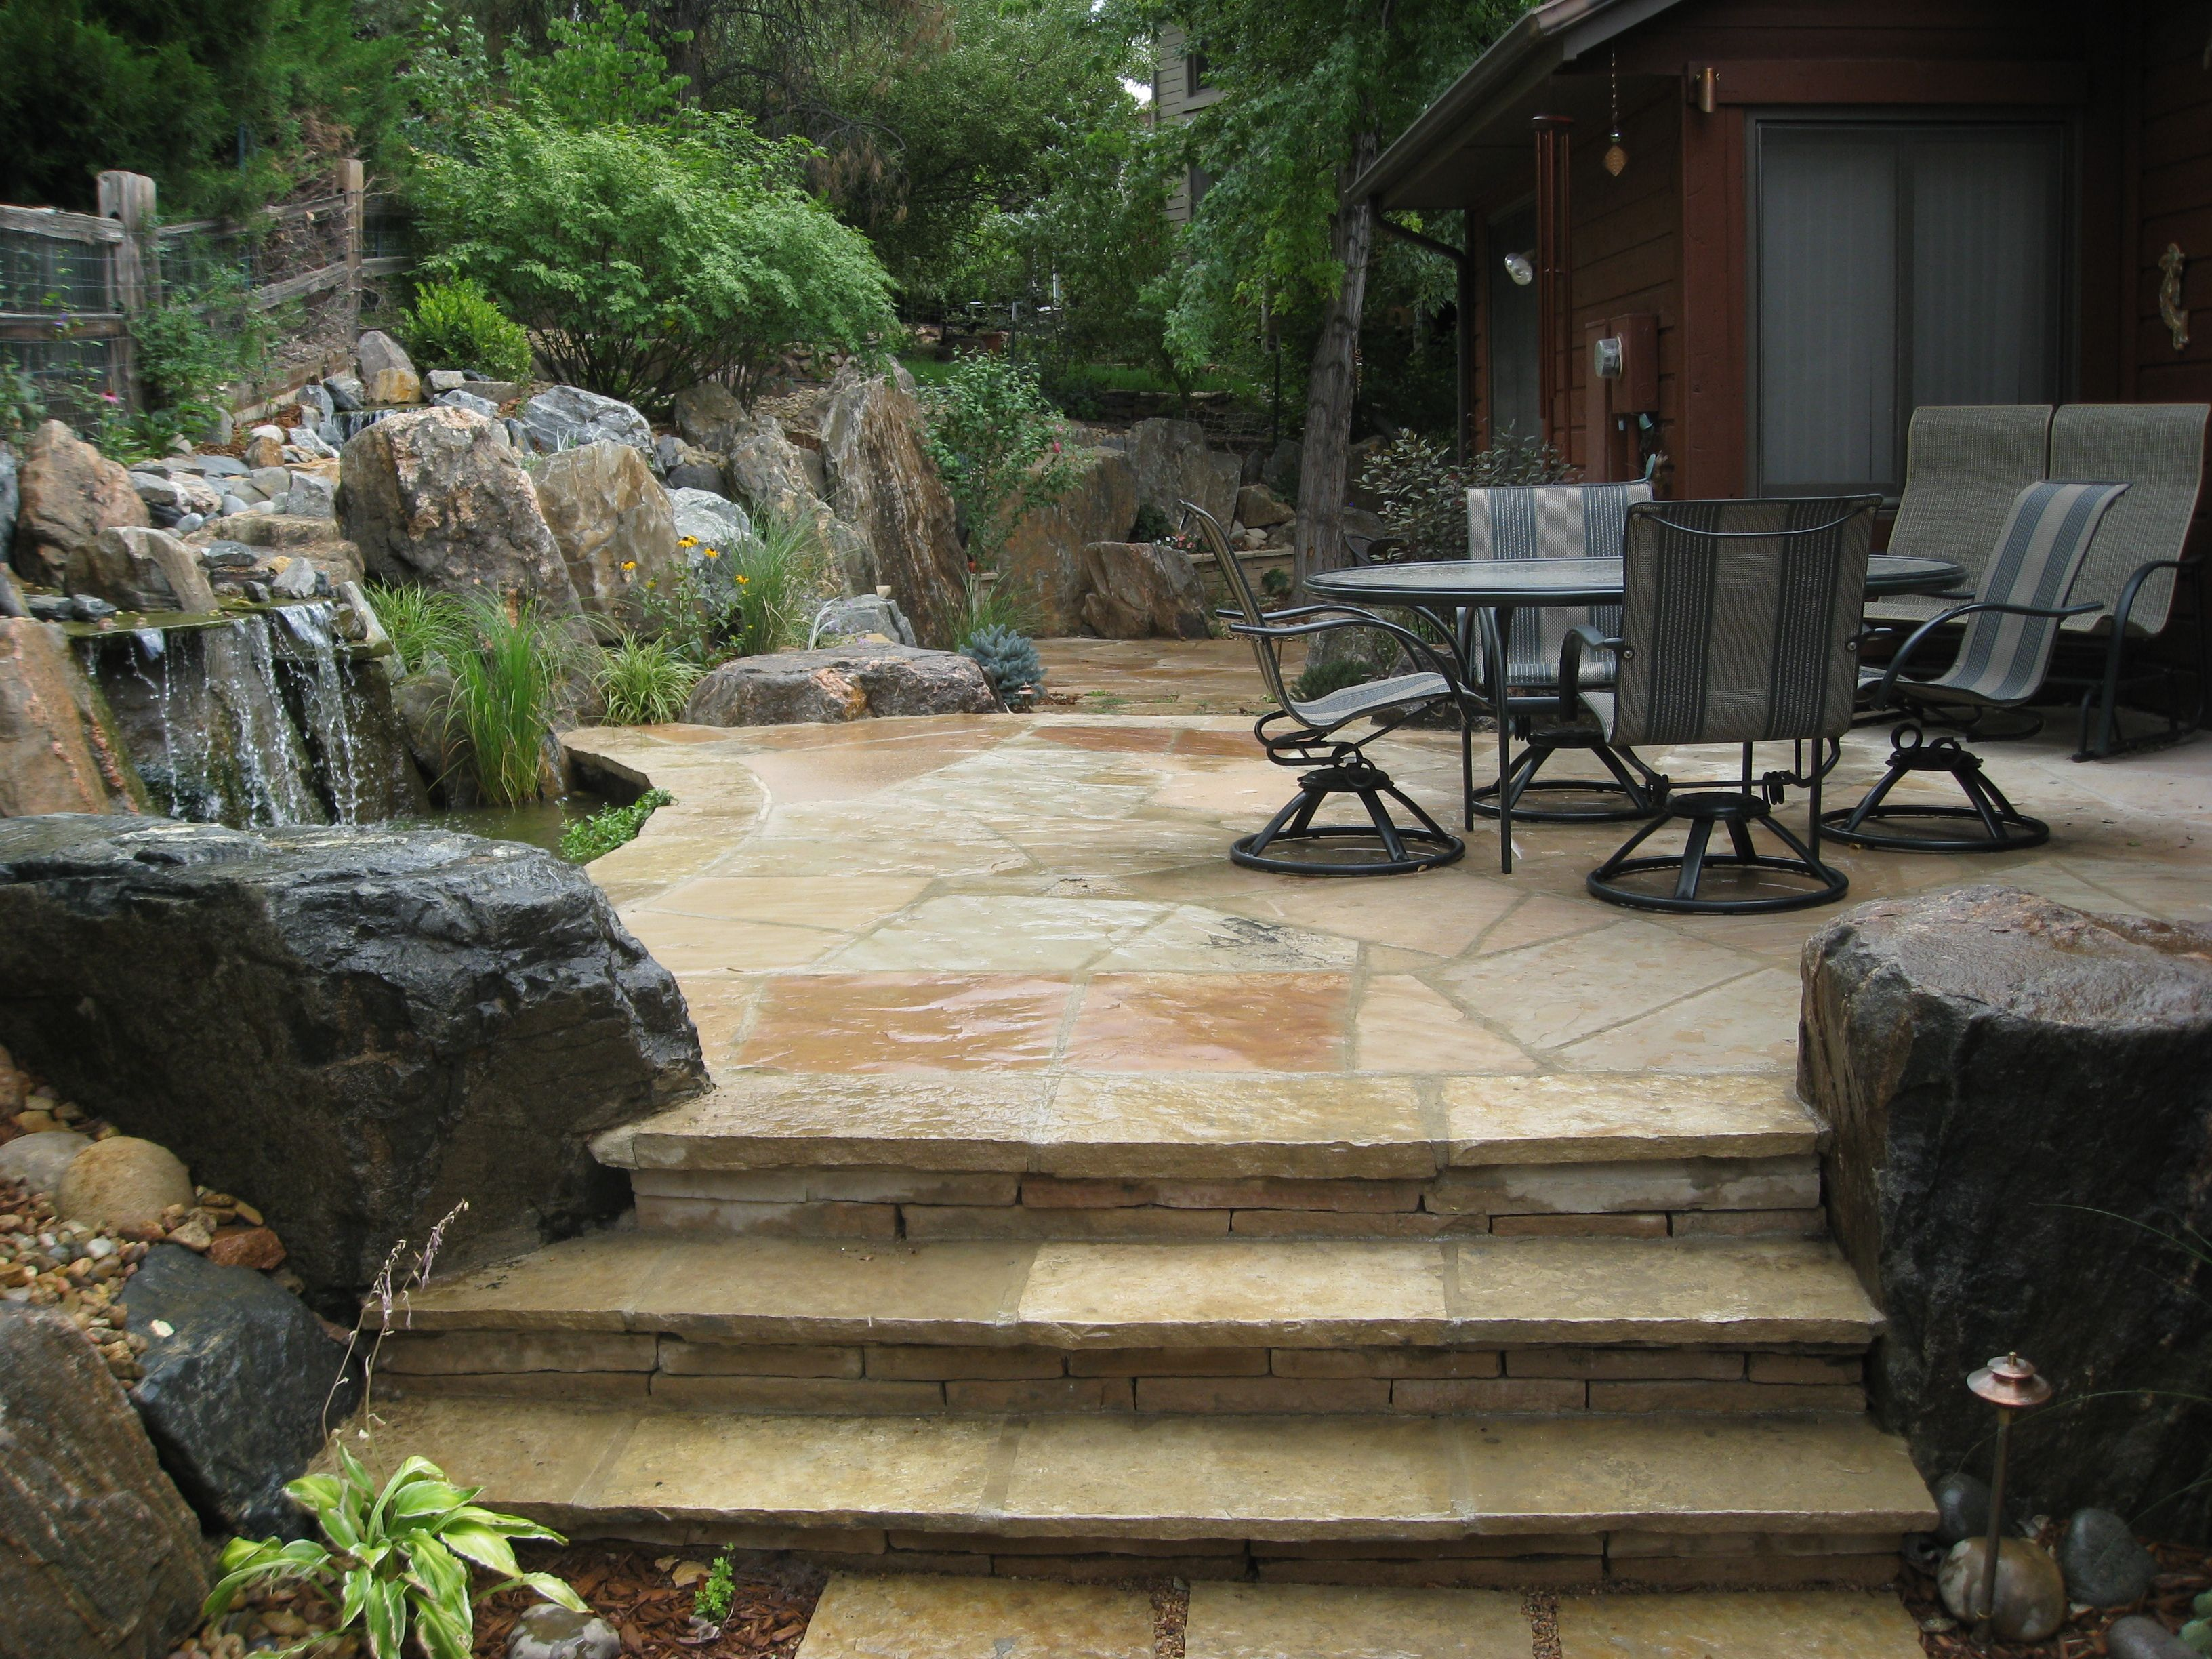 Backyard patio ideas flagstone - Backyard Patio Ideas Flagstone 32